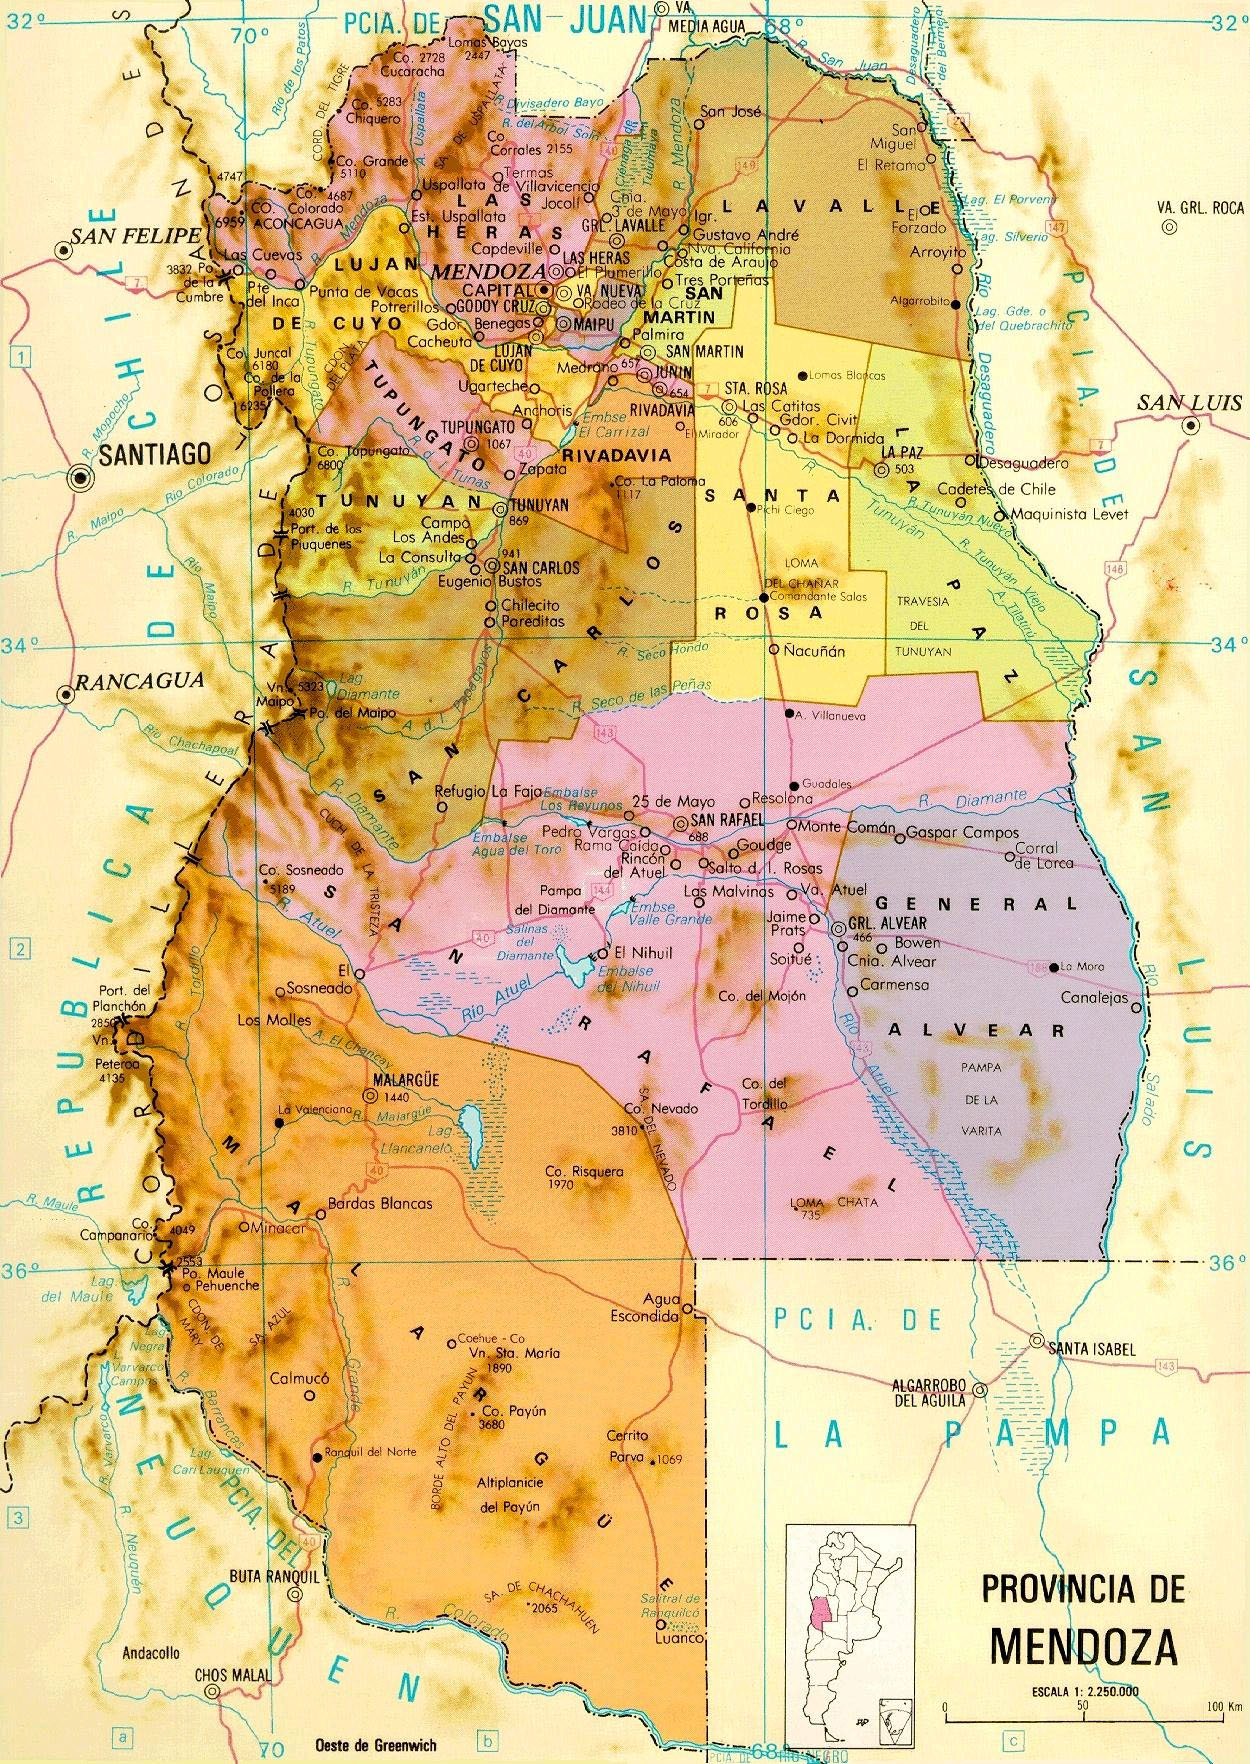 mendoza province map mendoza argentina mappery